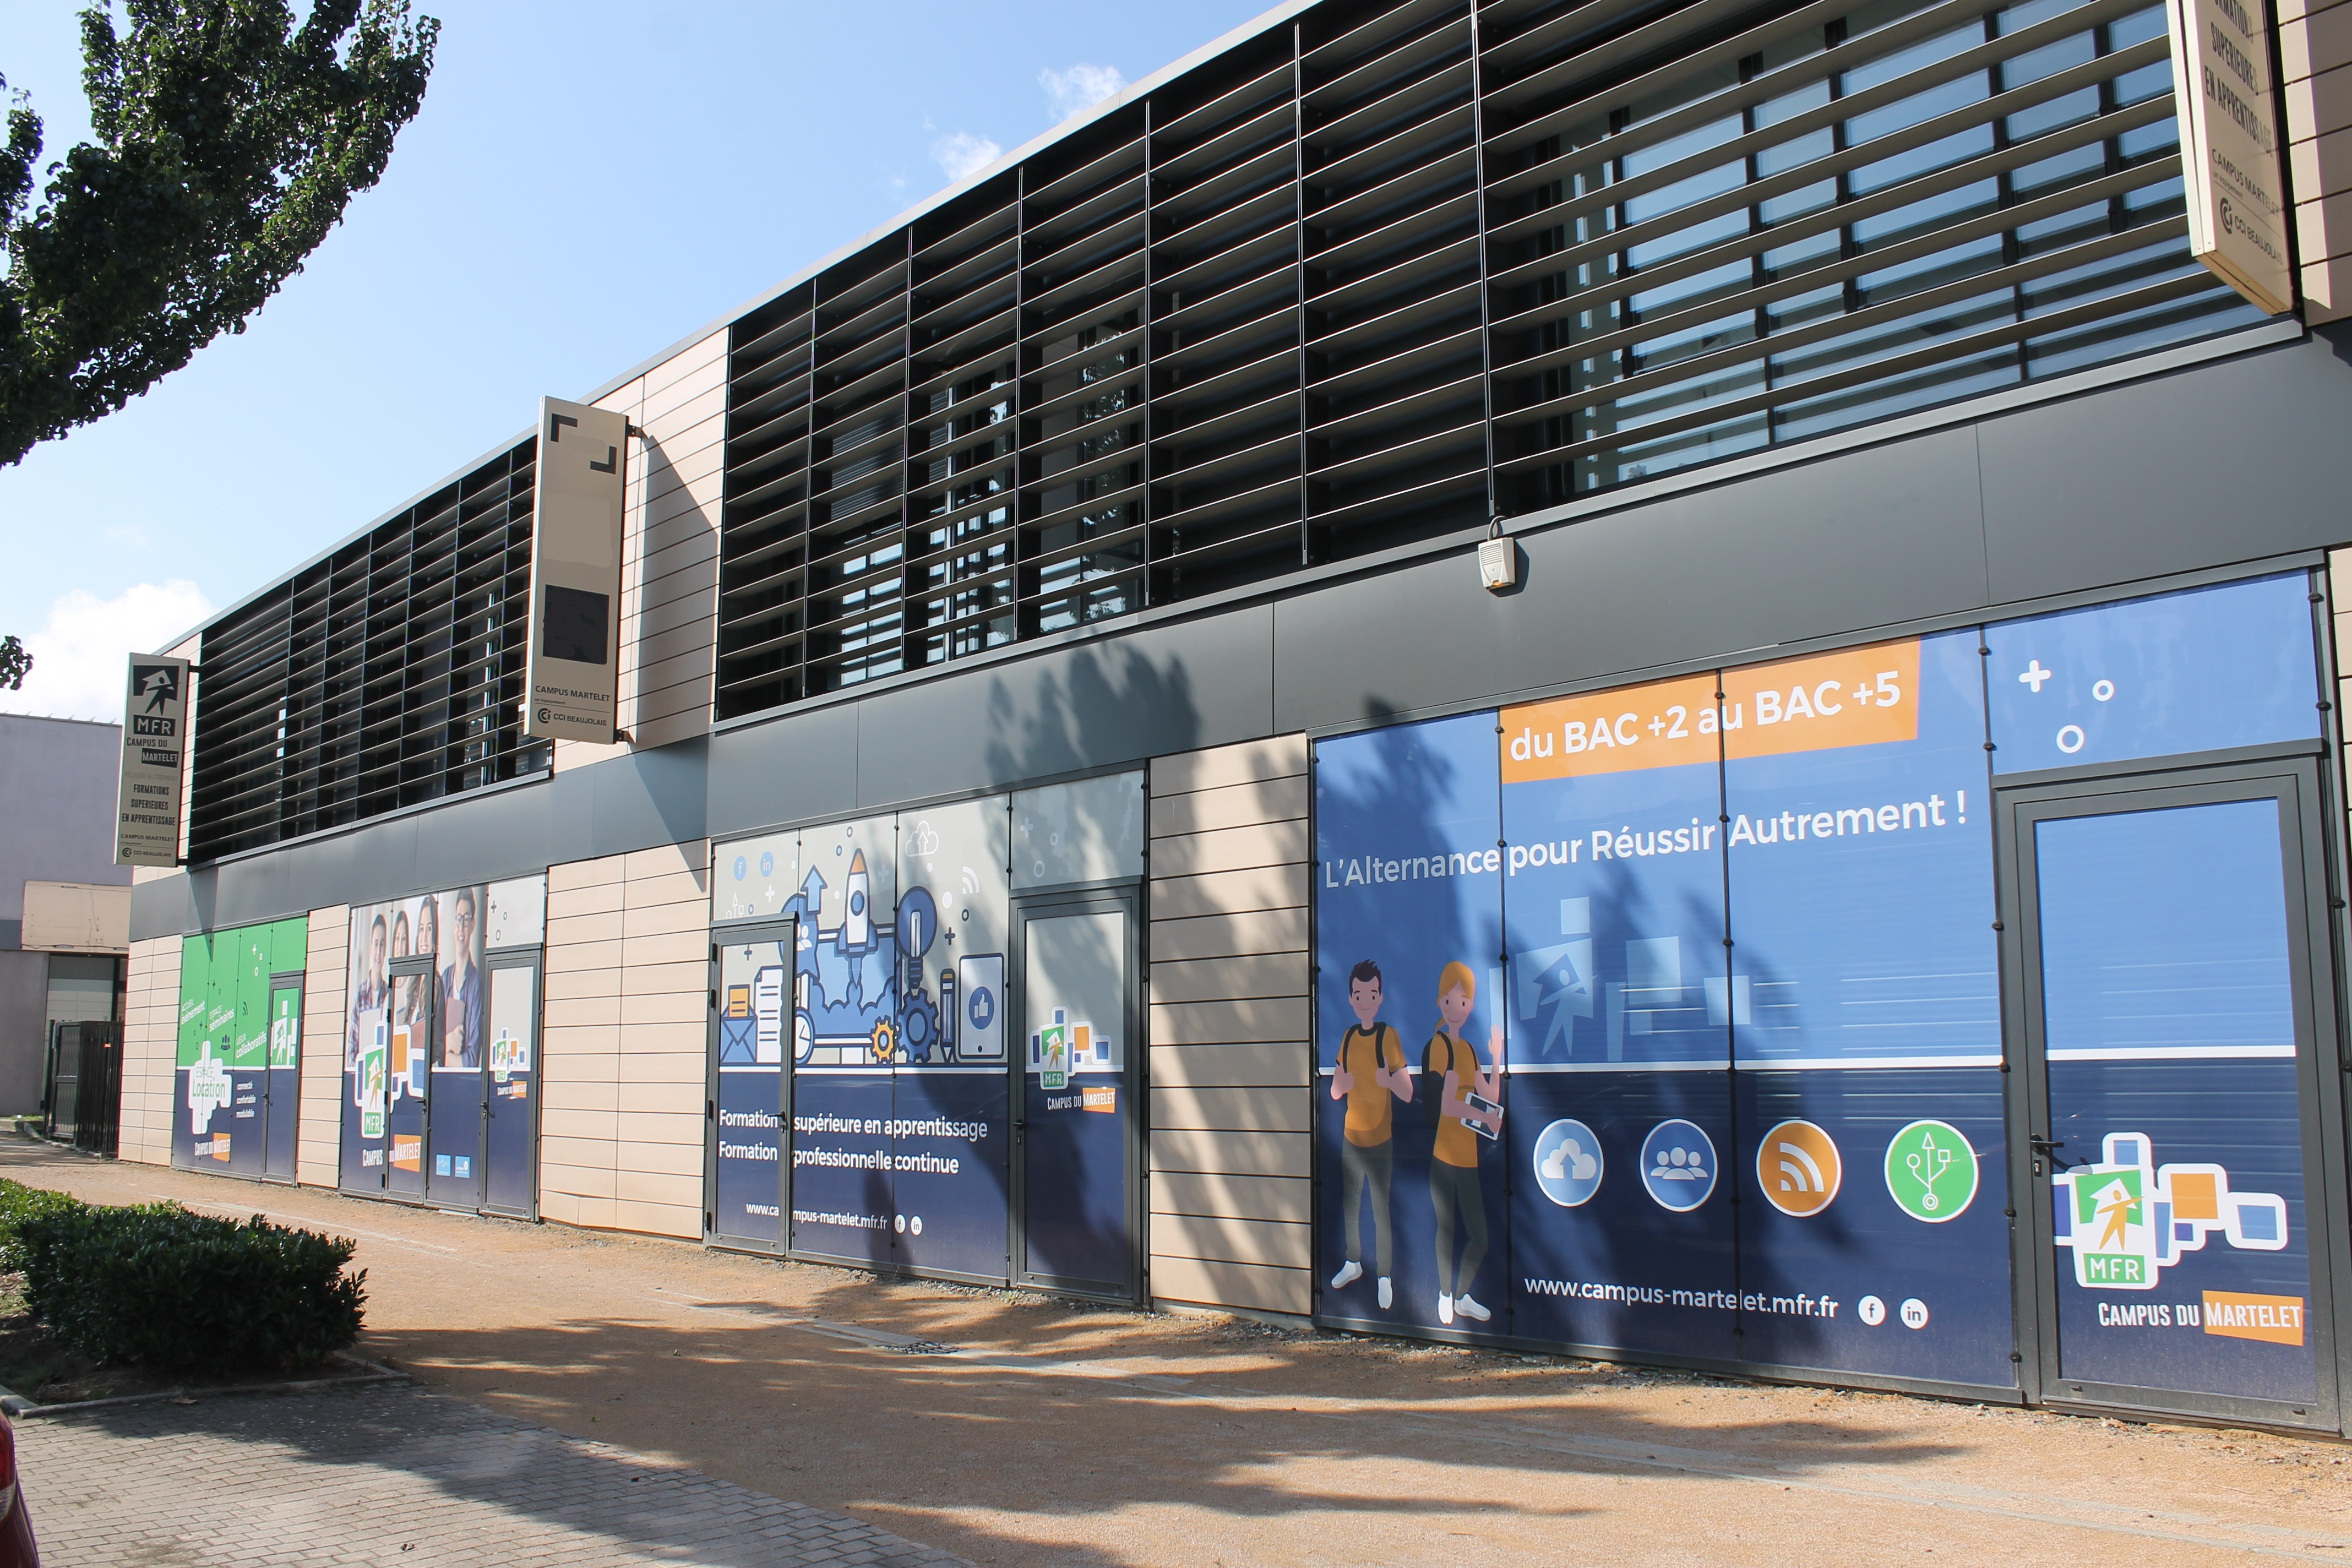 Campus Martelet 01.JPG